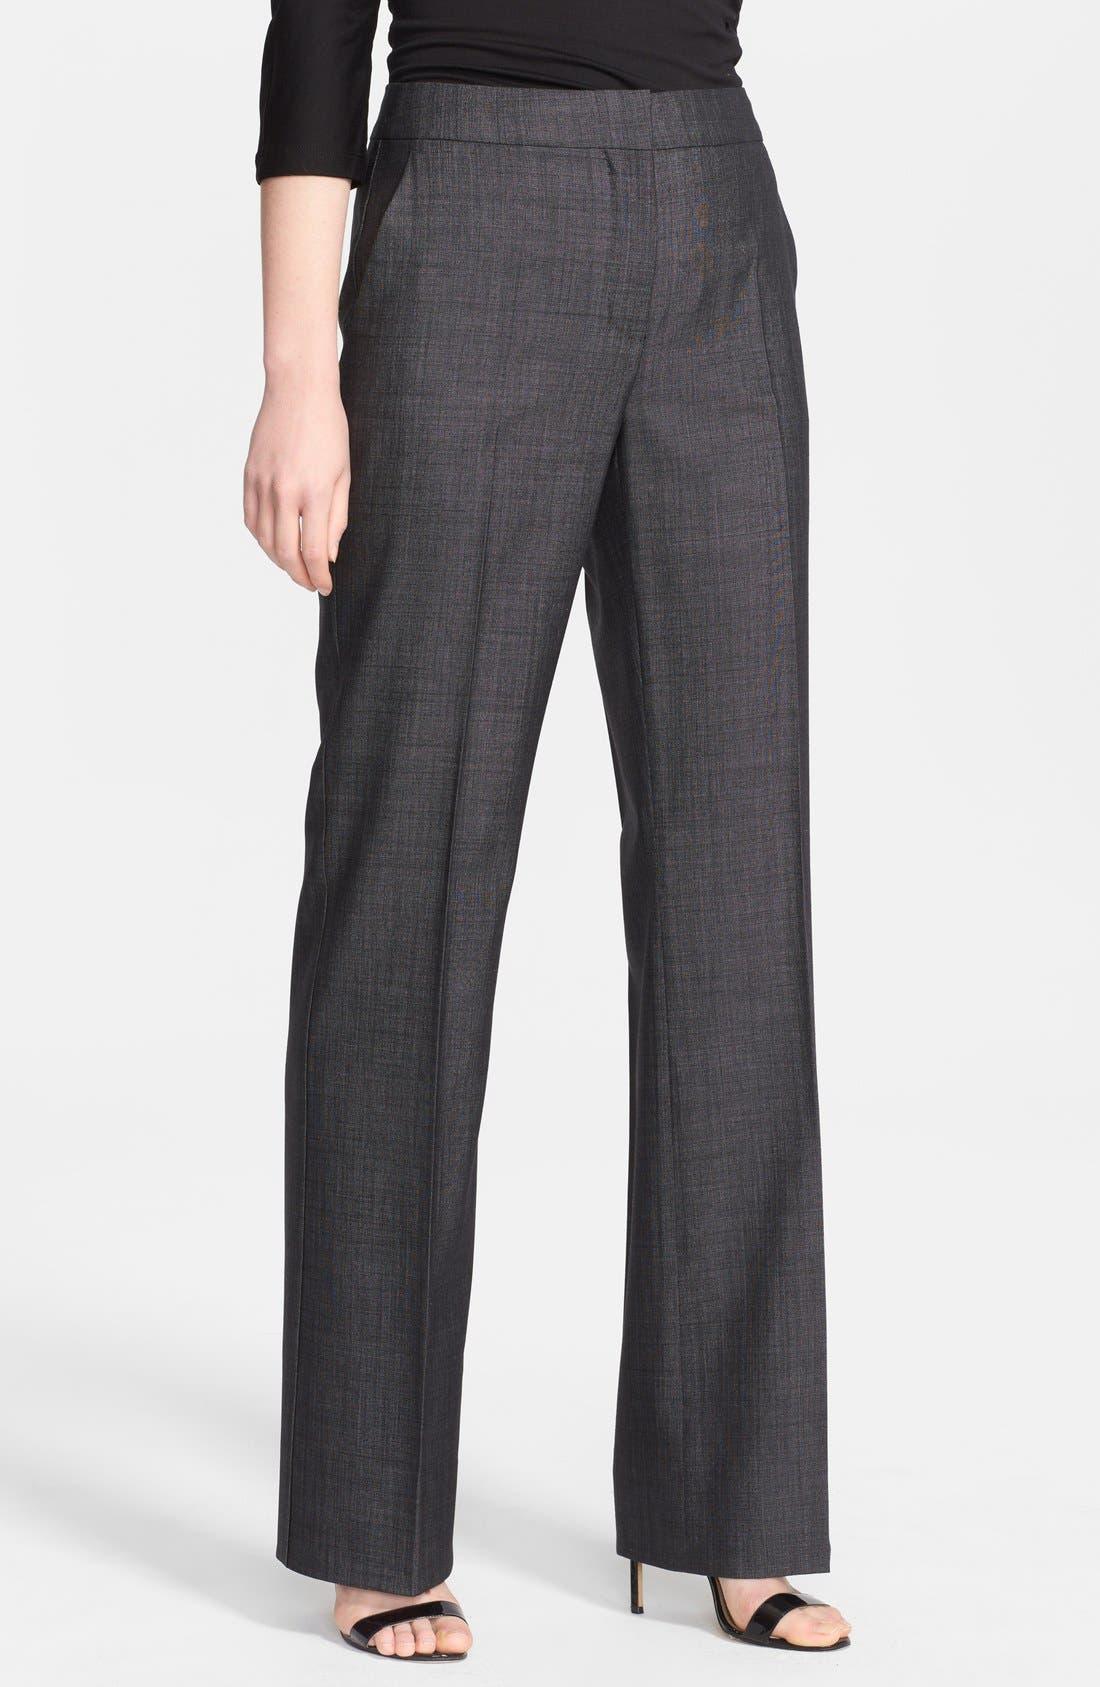 Alternate Image 1 Selected - Max Mara 'Allesia' Wool Blend Pants